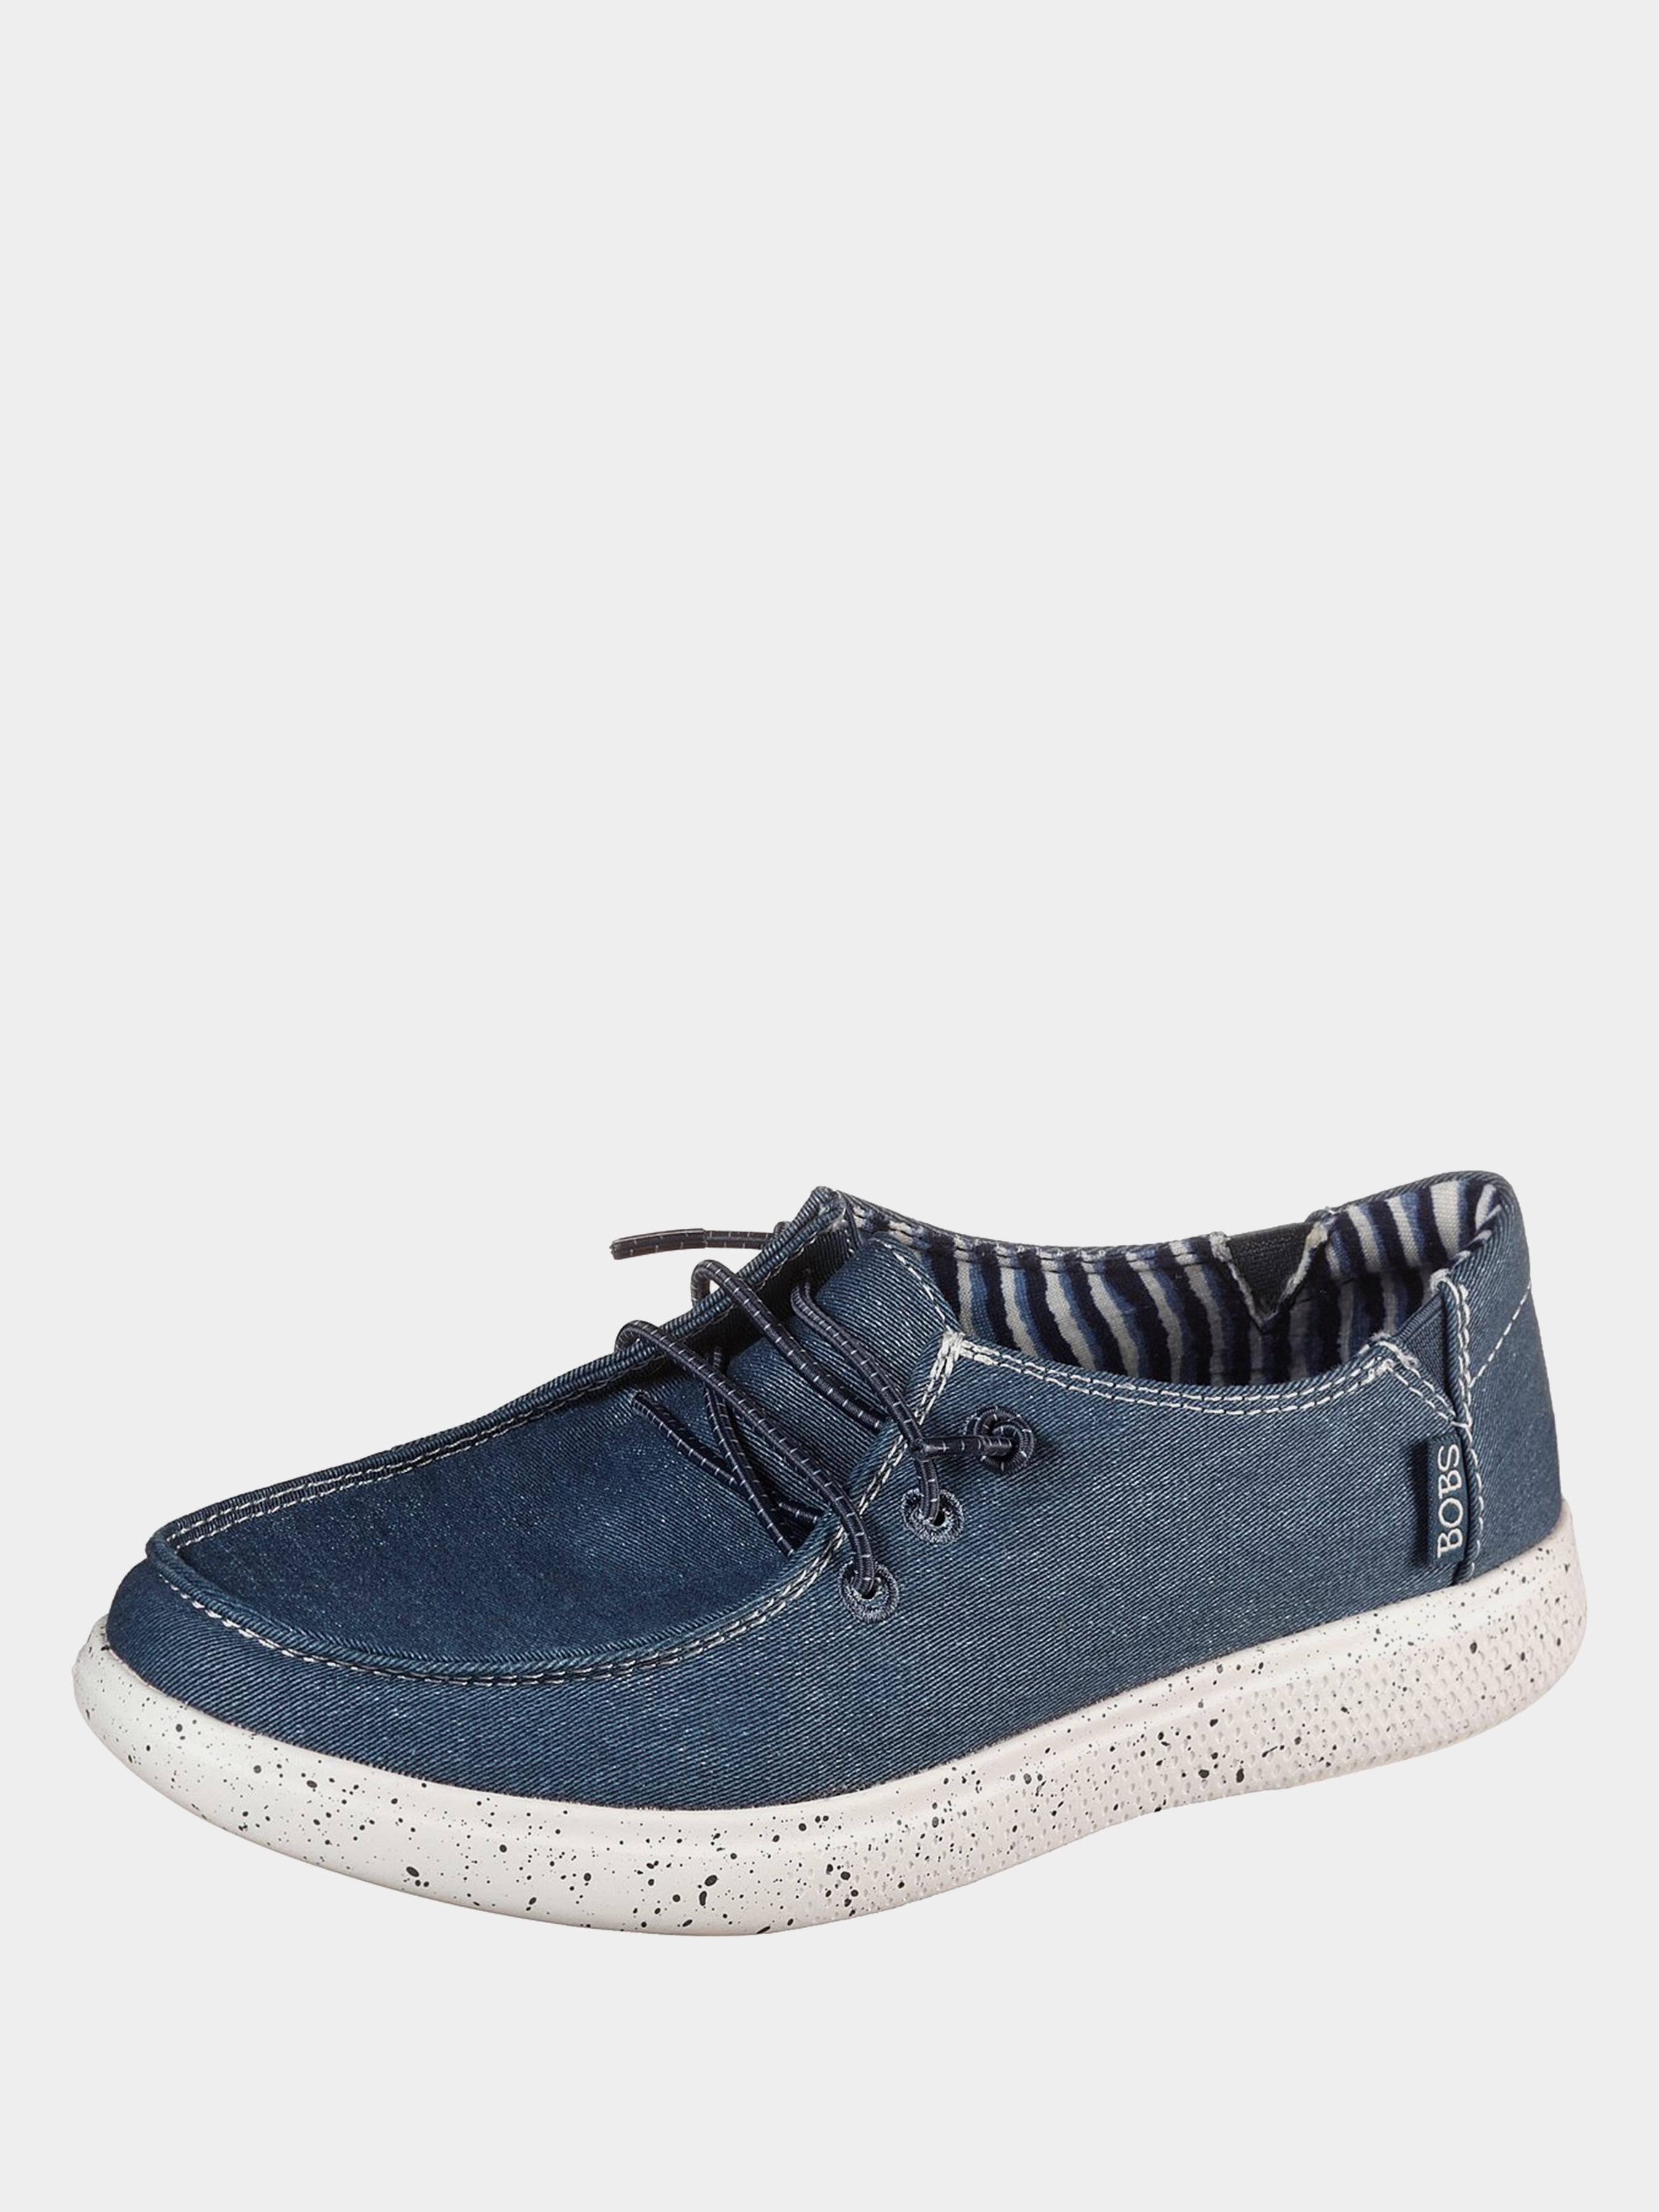 Кросівки для міста Skechers BOBS Skipper - Summer Life 113449 NVY